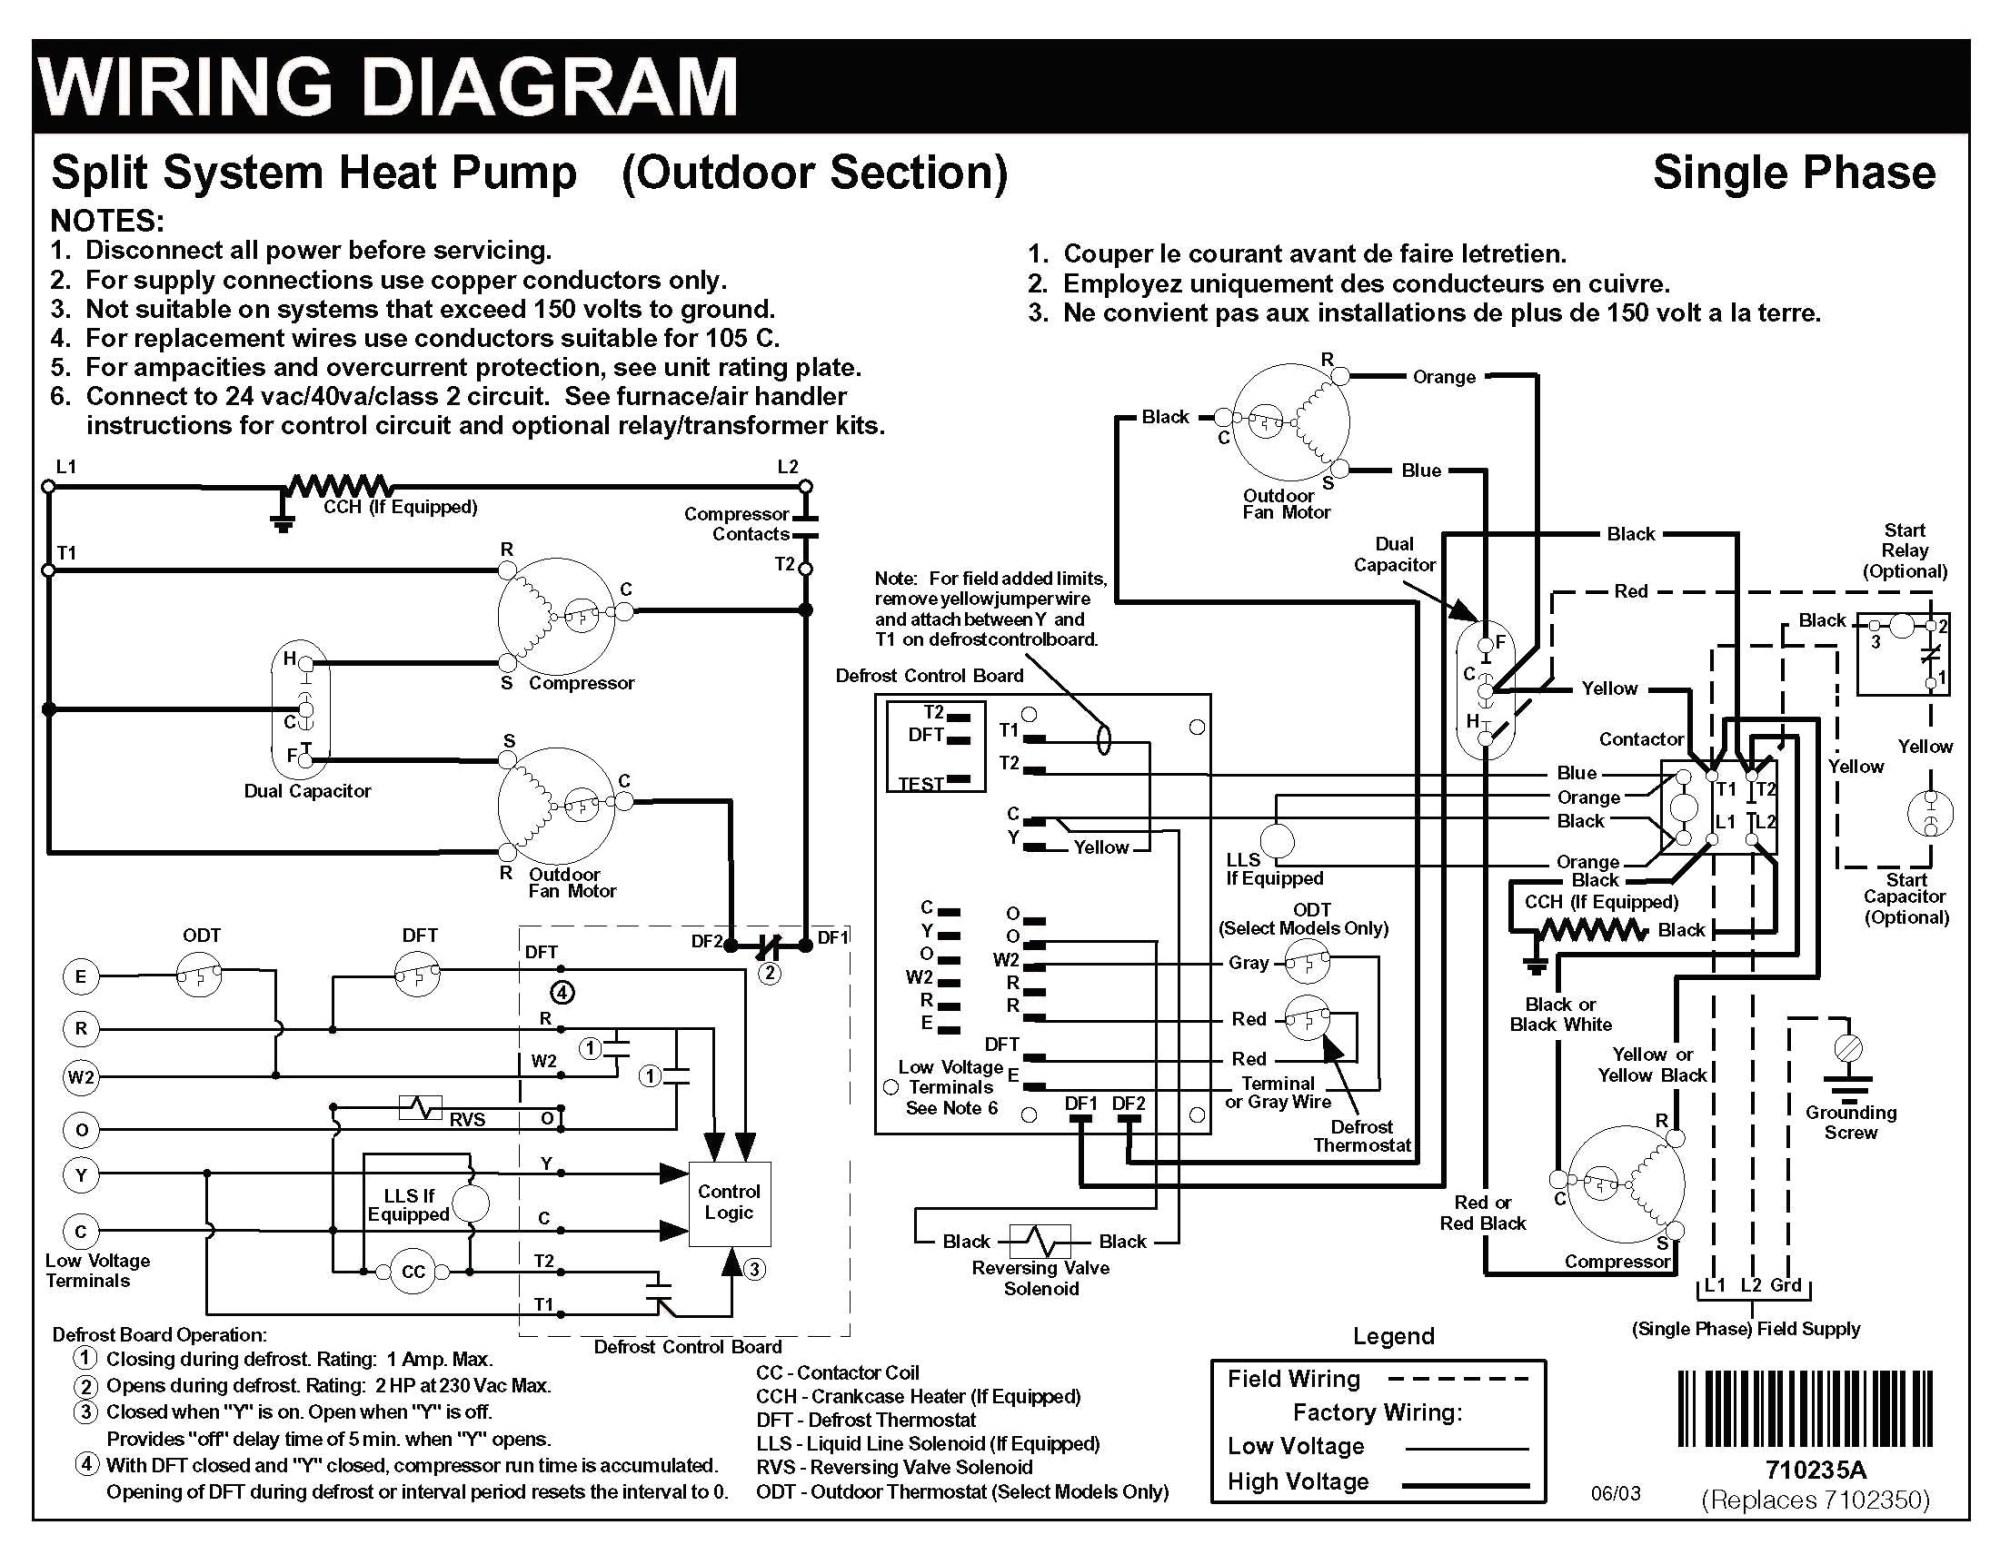 hight resolution of heat pump thermostat wiring diagram wiring diagram hvac thermostat fresh nest thermostat wiring diagram heat